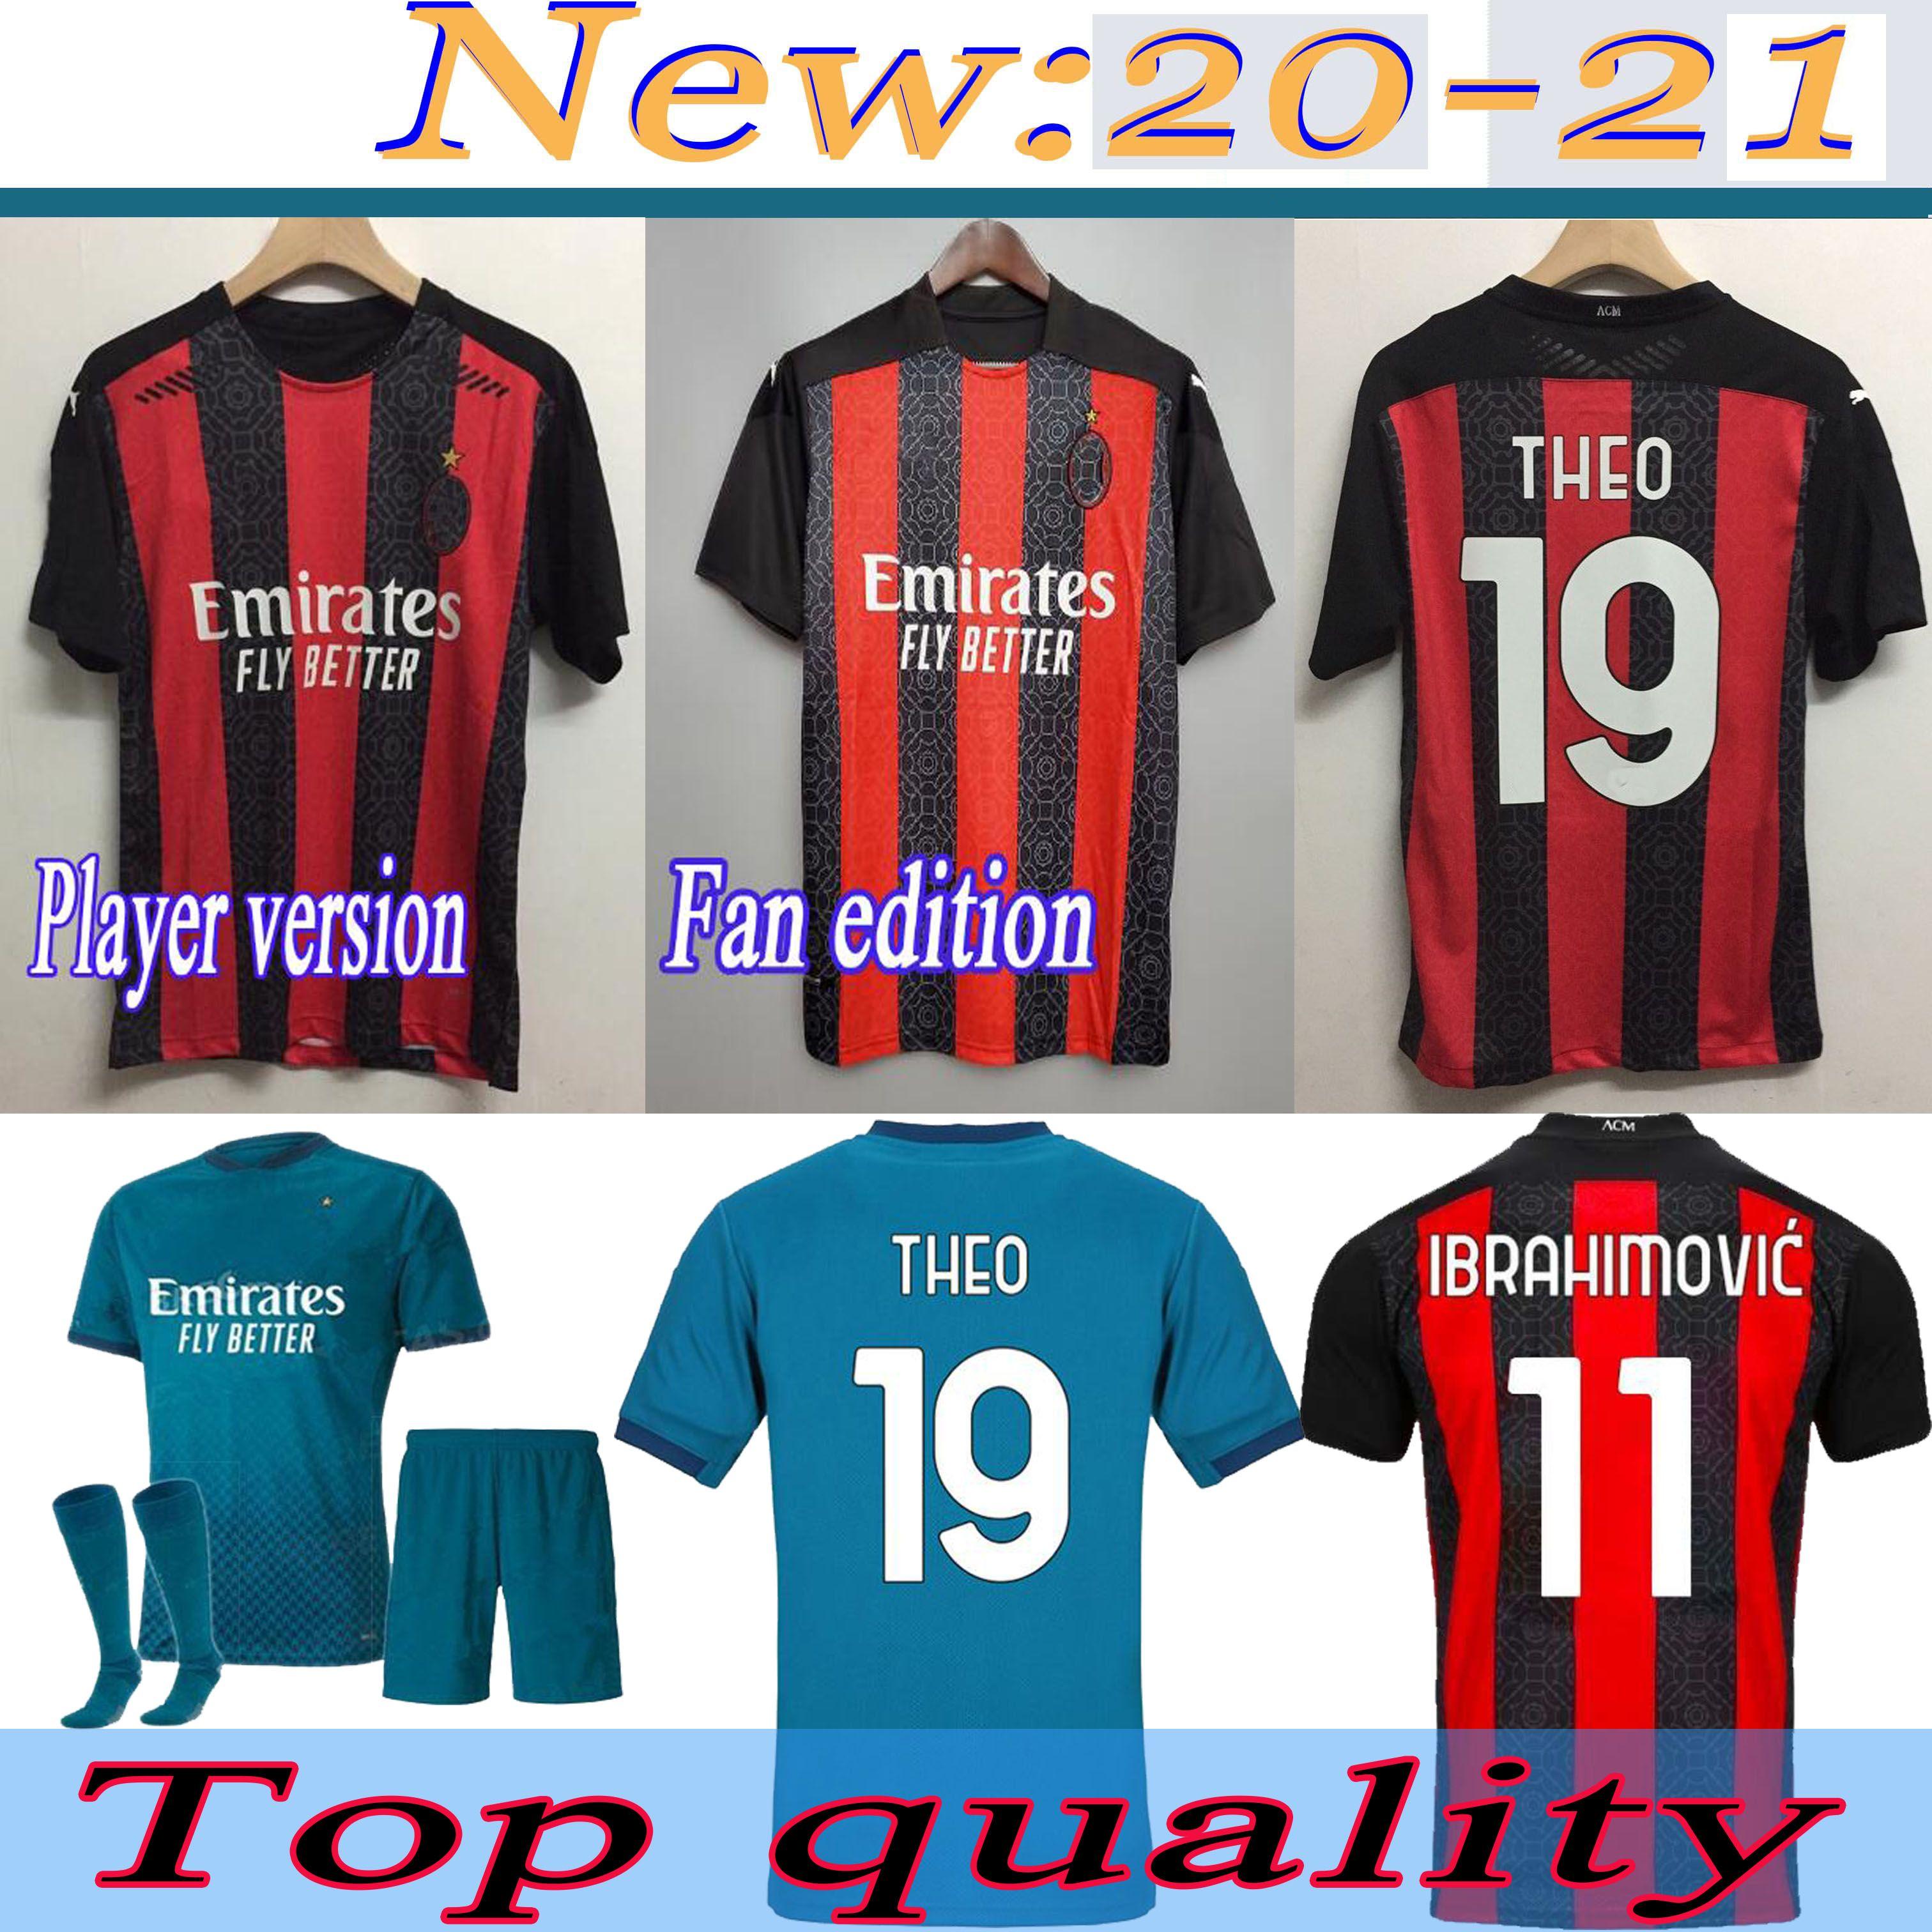 Adult suit kids suit IBRAHIMOVI AC milan soccer jerseys 2020/2021 Player version Fan edition soccer shirts Customized men Football Uniforms